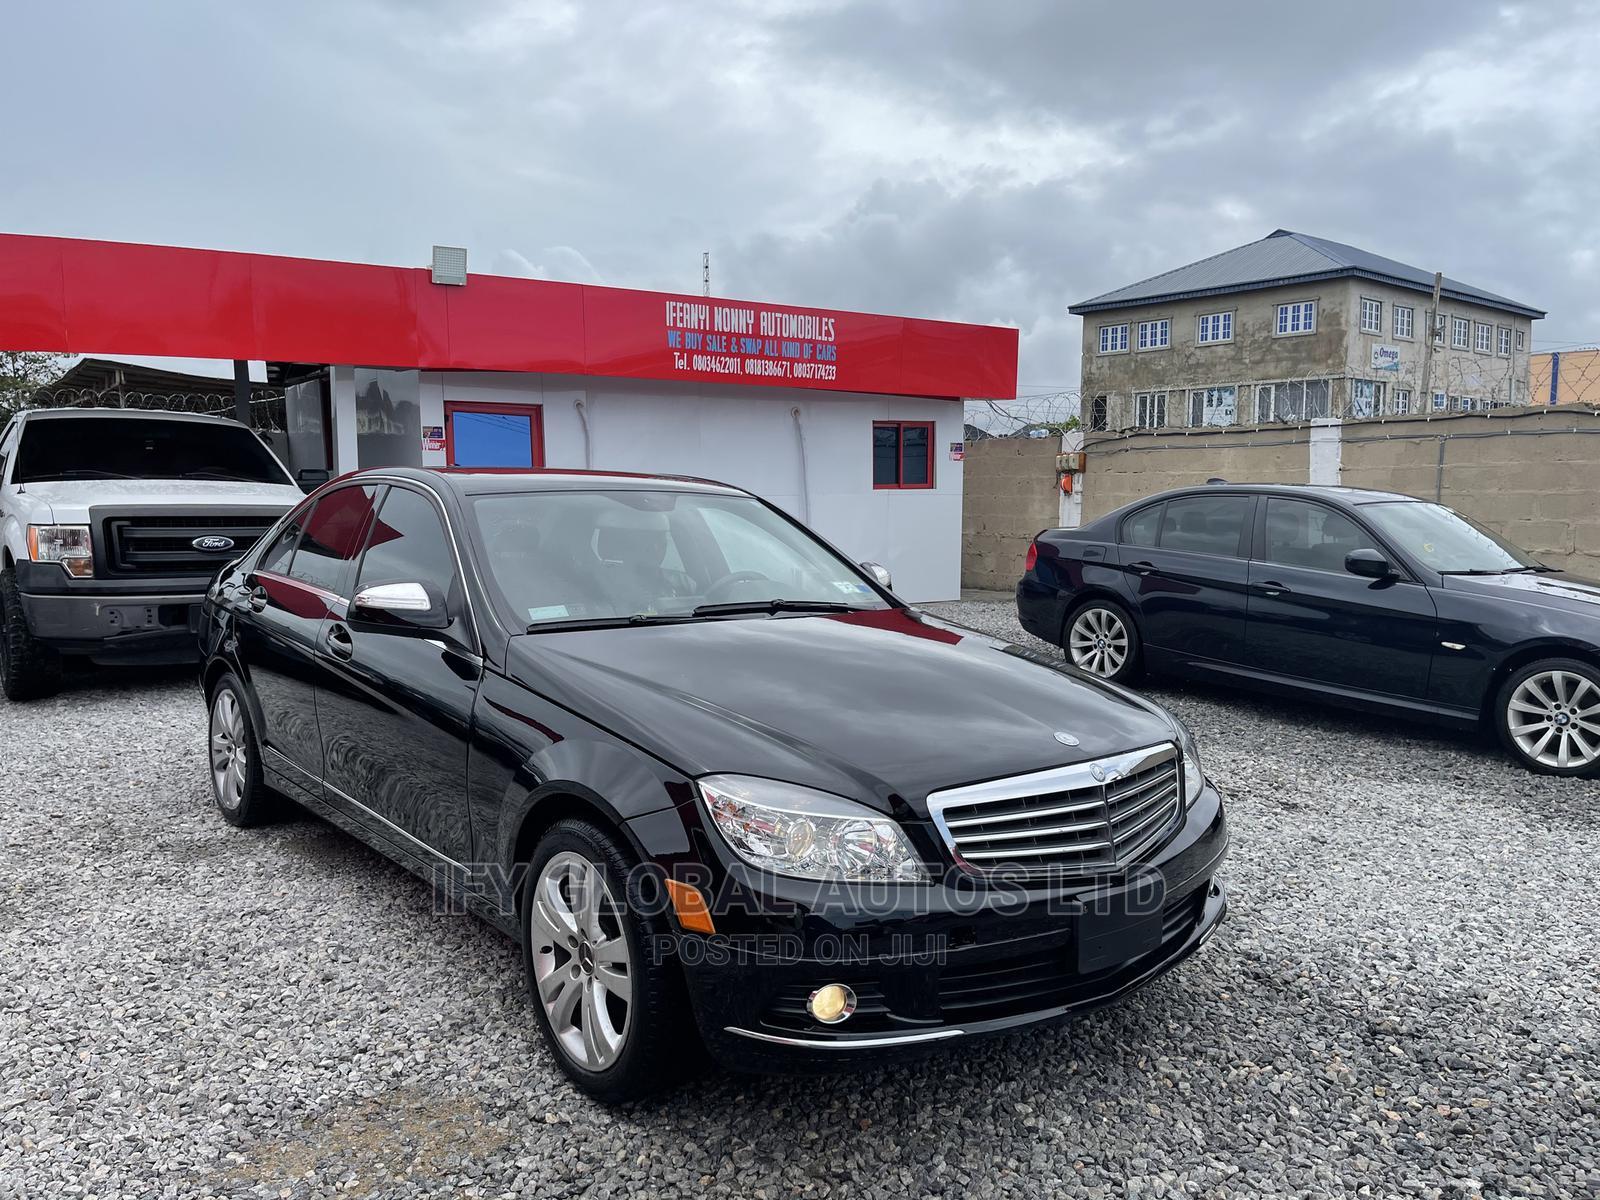 Mercedes-Benz C300 2008 Black | Cars for sale in Amuwo-Odofin, Lagos State, Nigeria